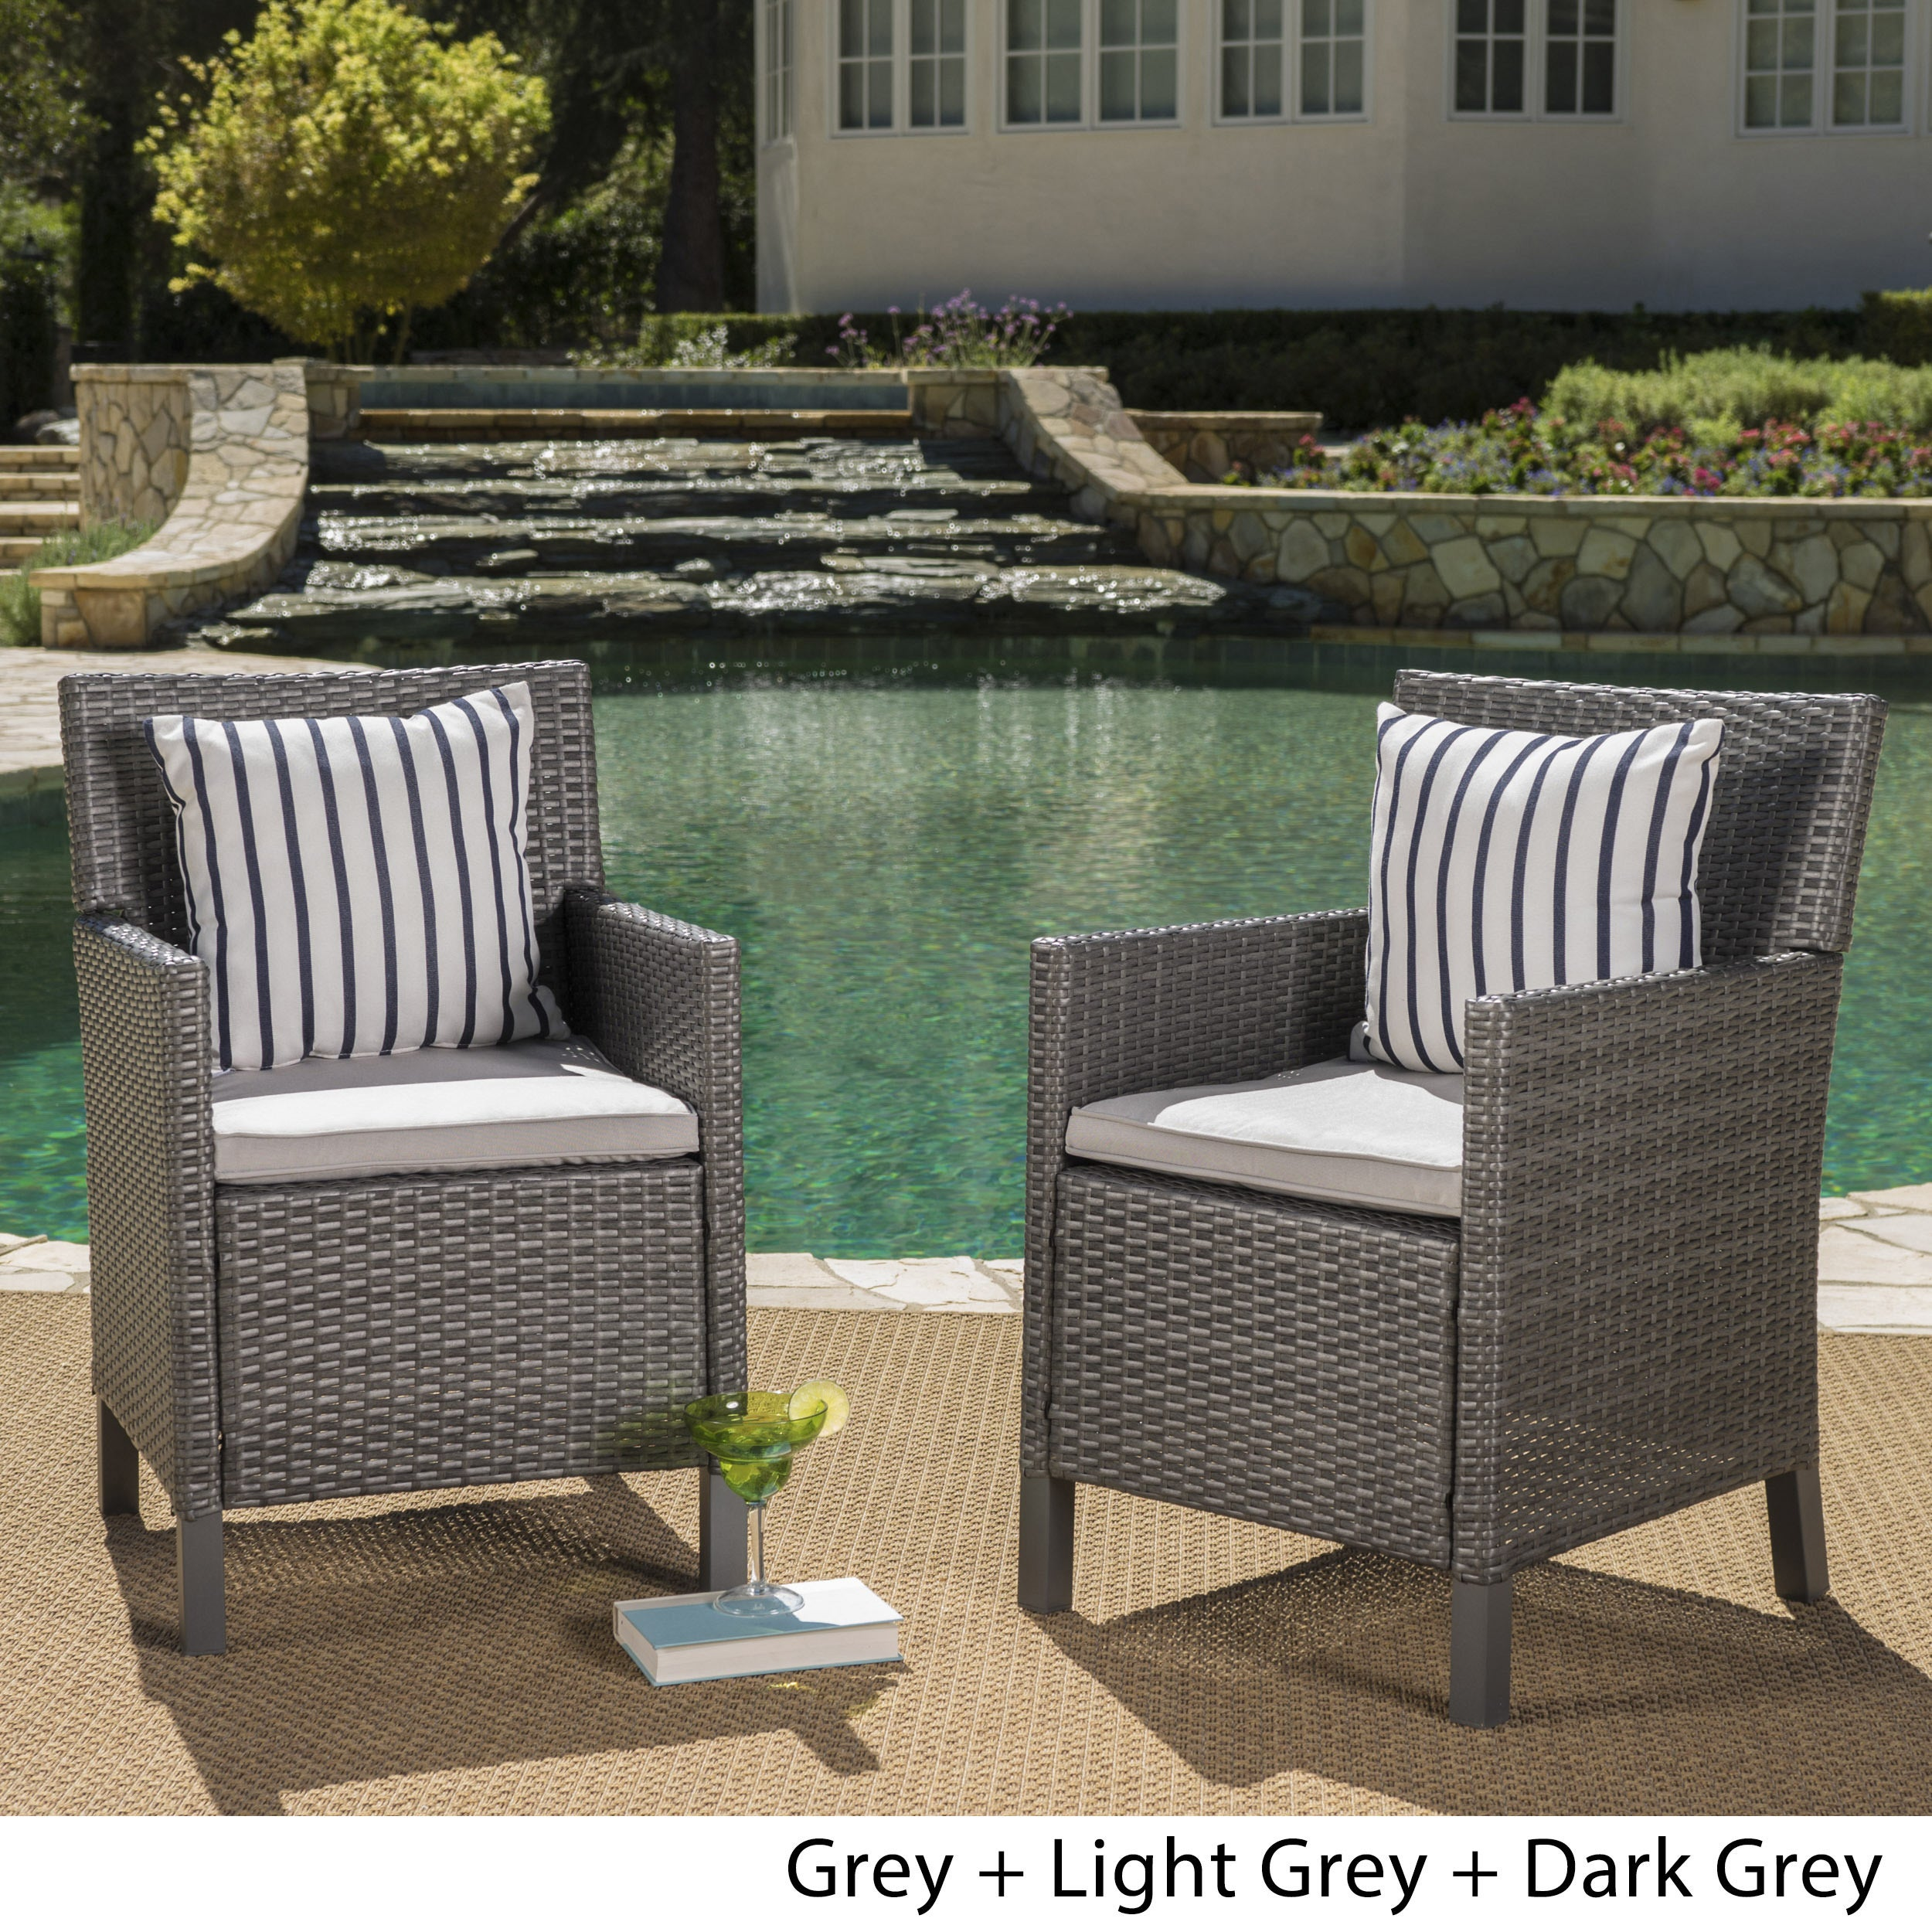 Grey Wicker Patio Furniture Find Great